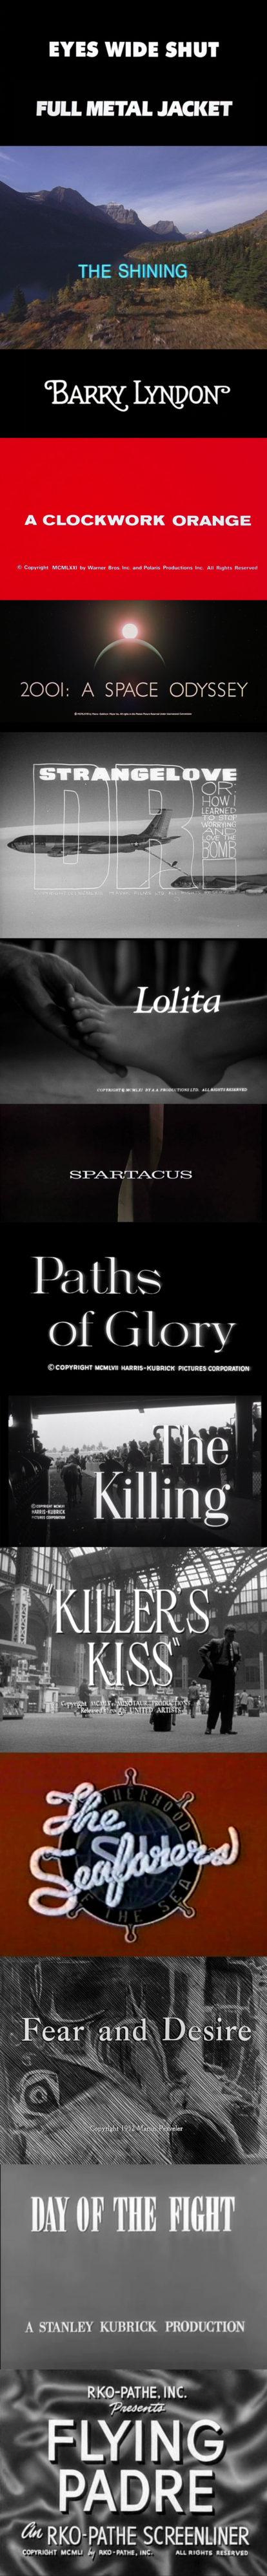 Kubrick Titles